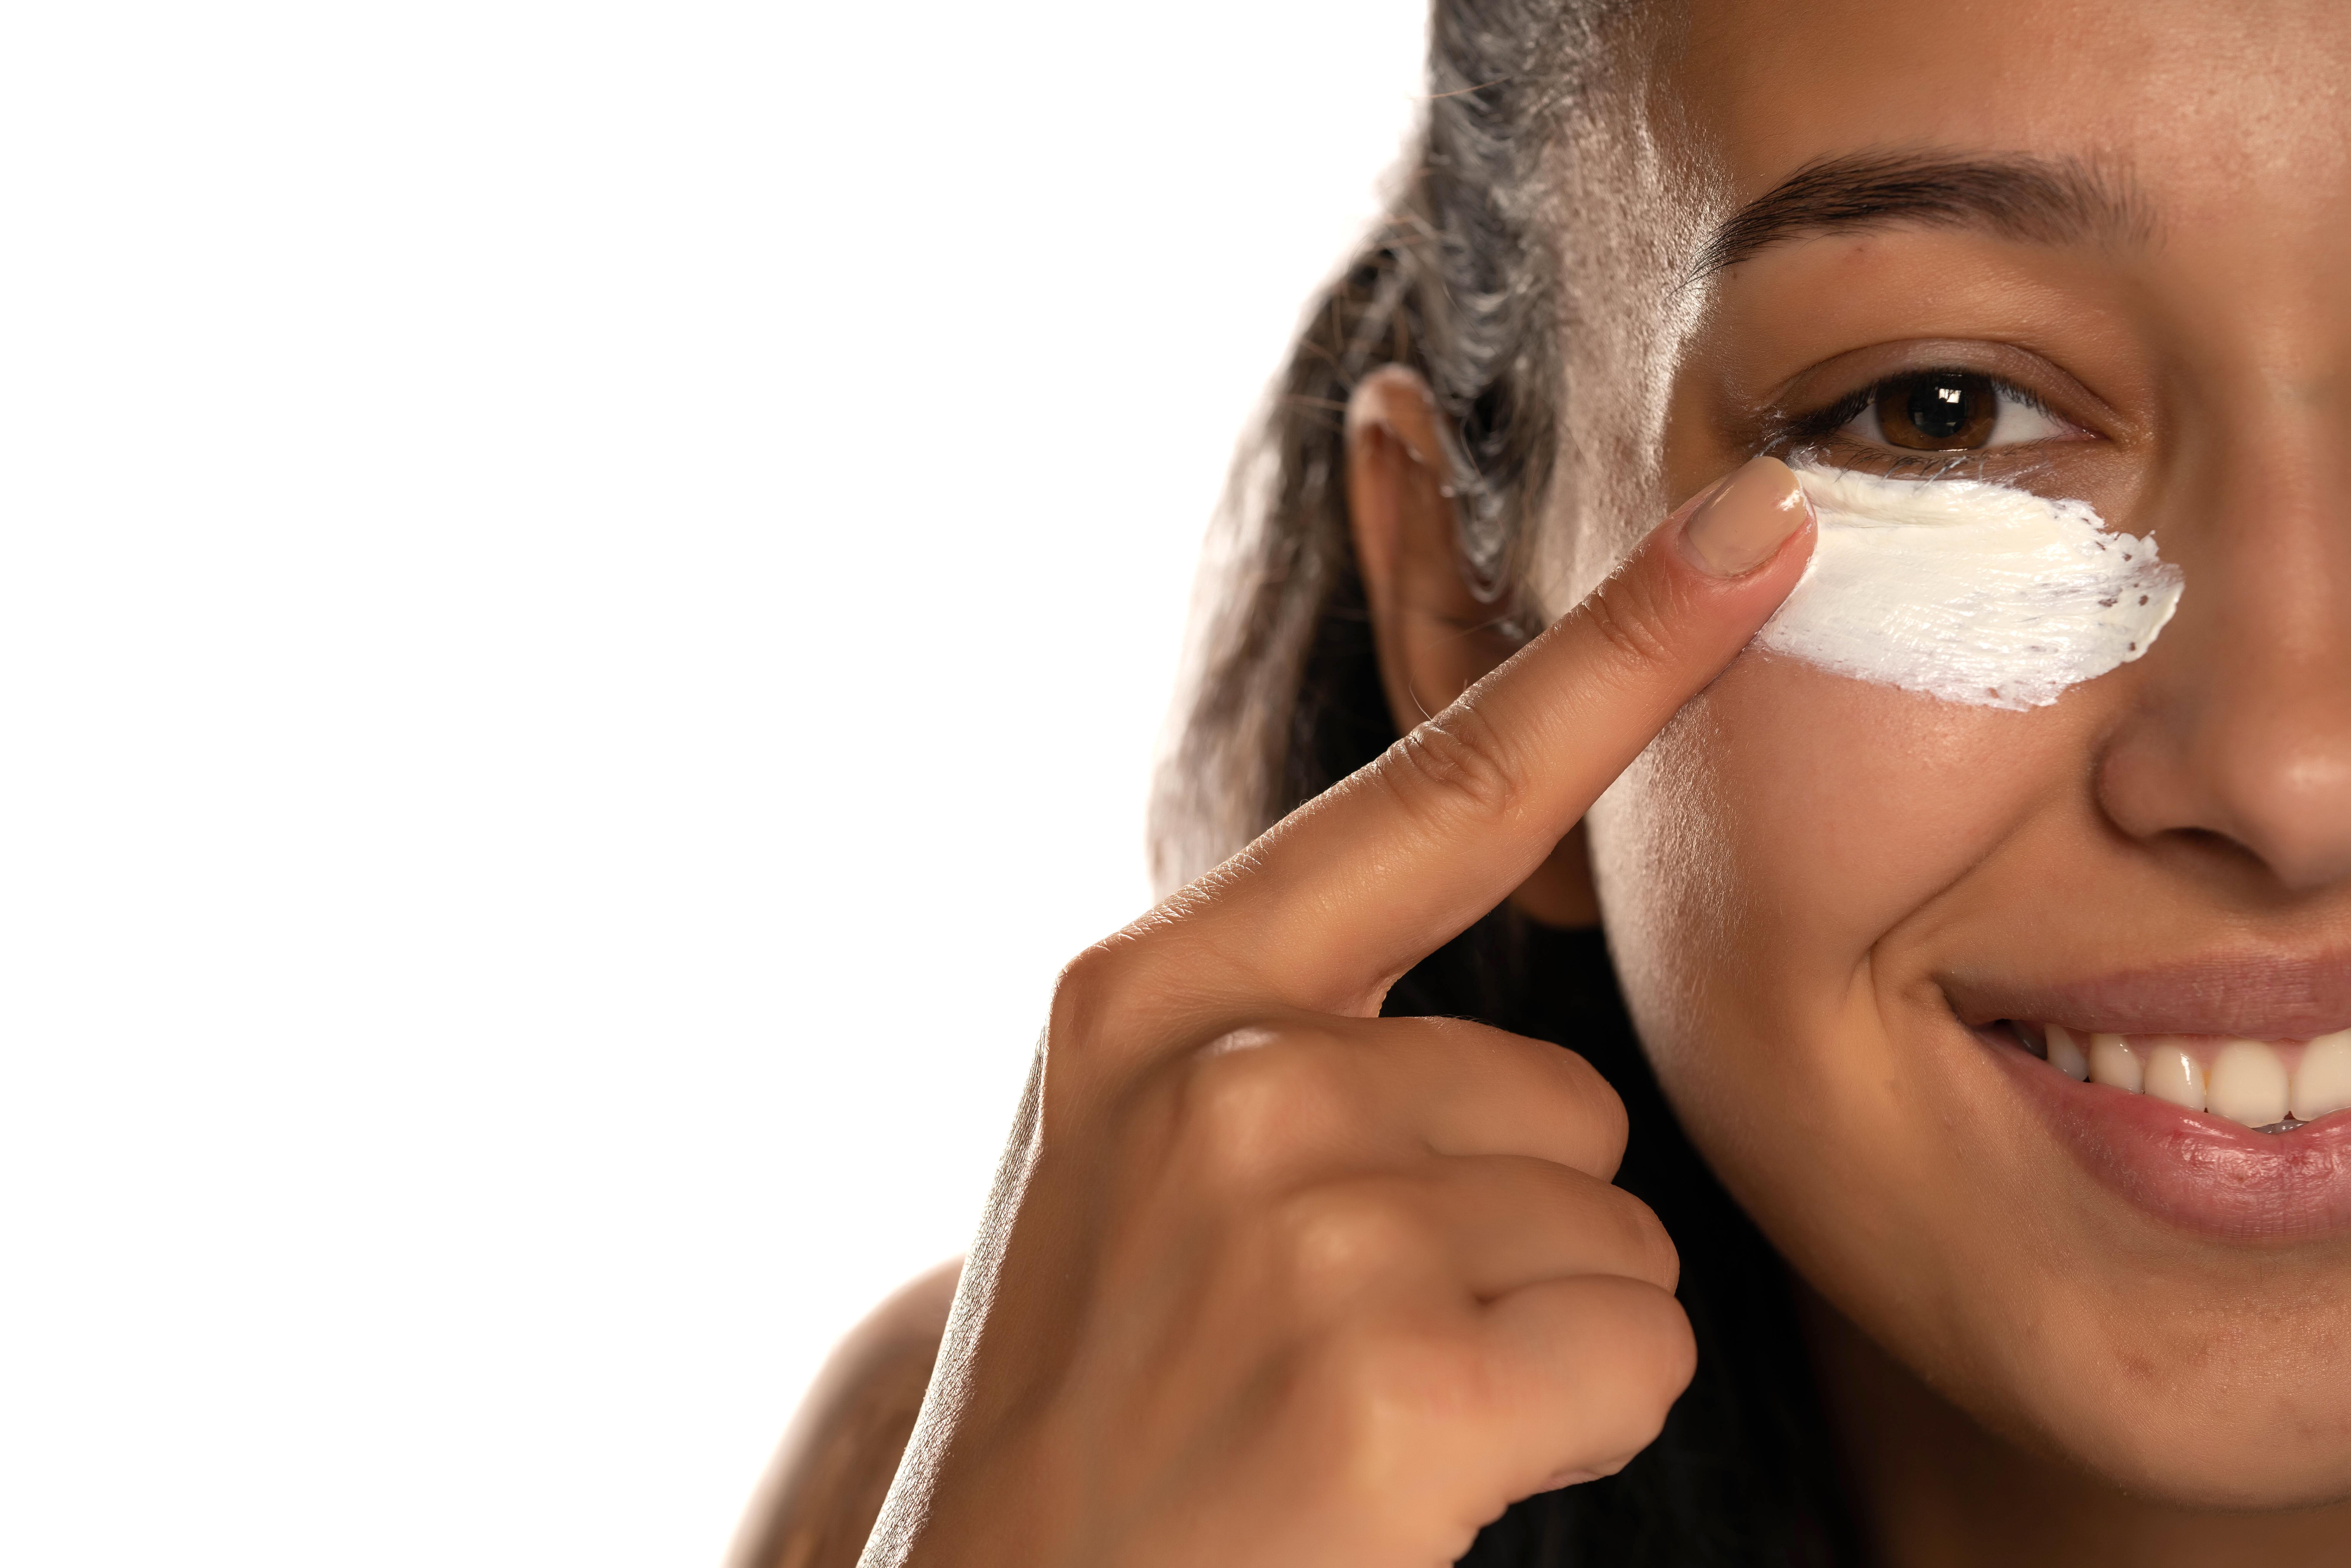 The girl uses cream under the eye